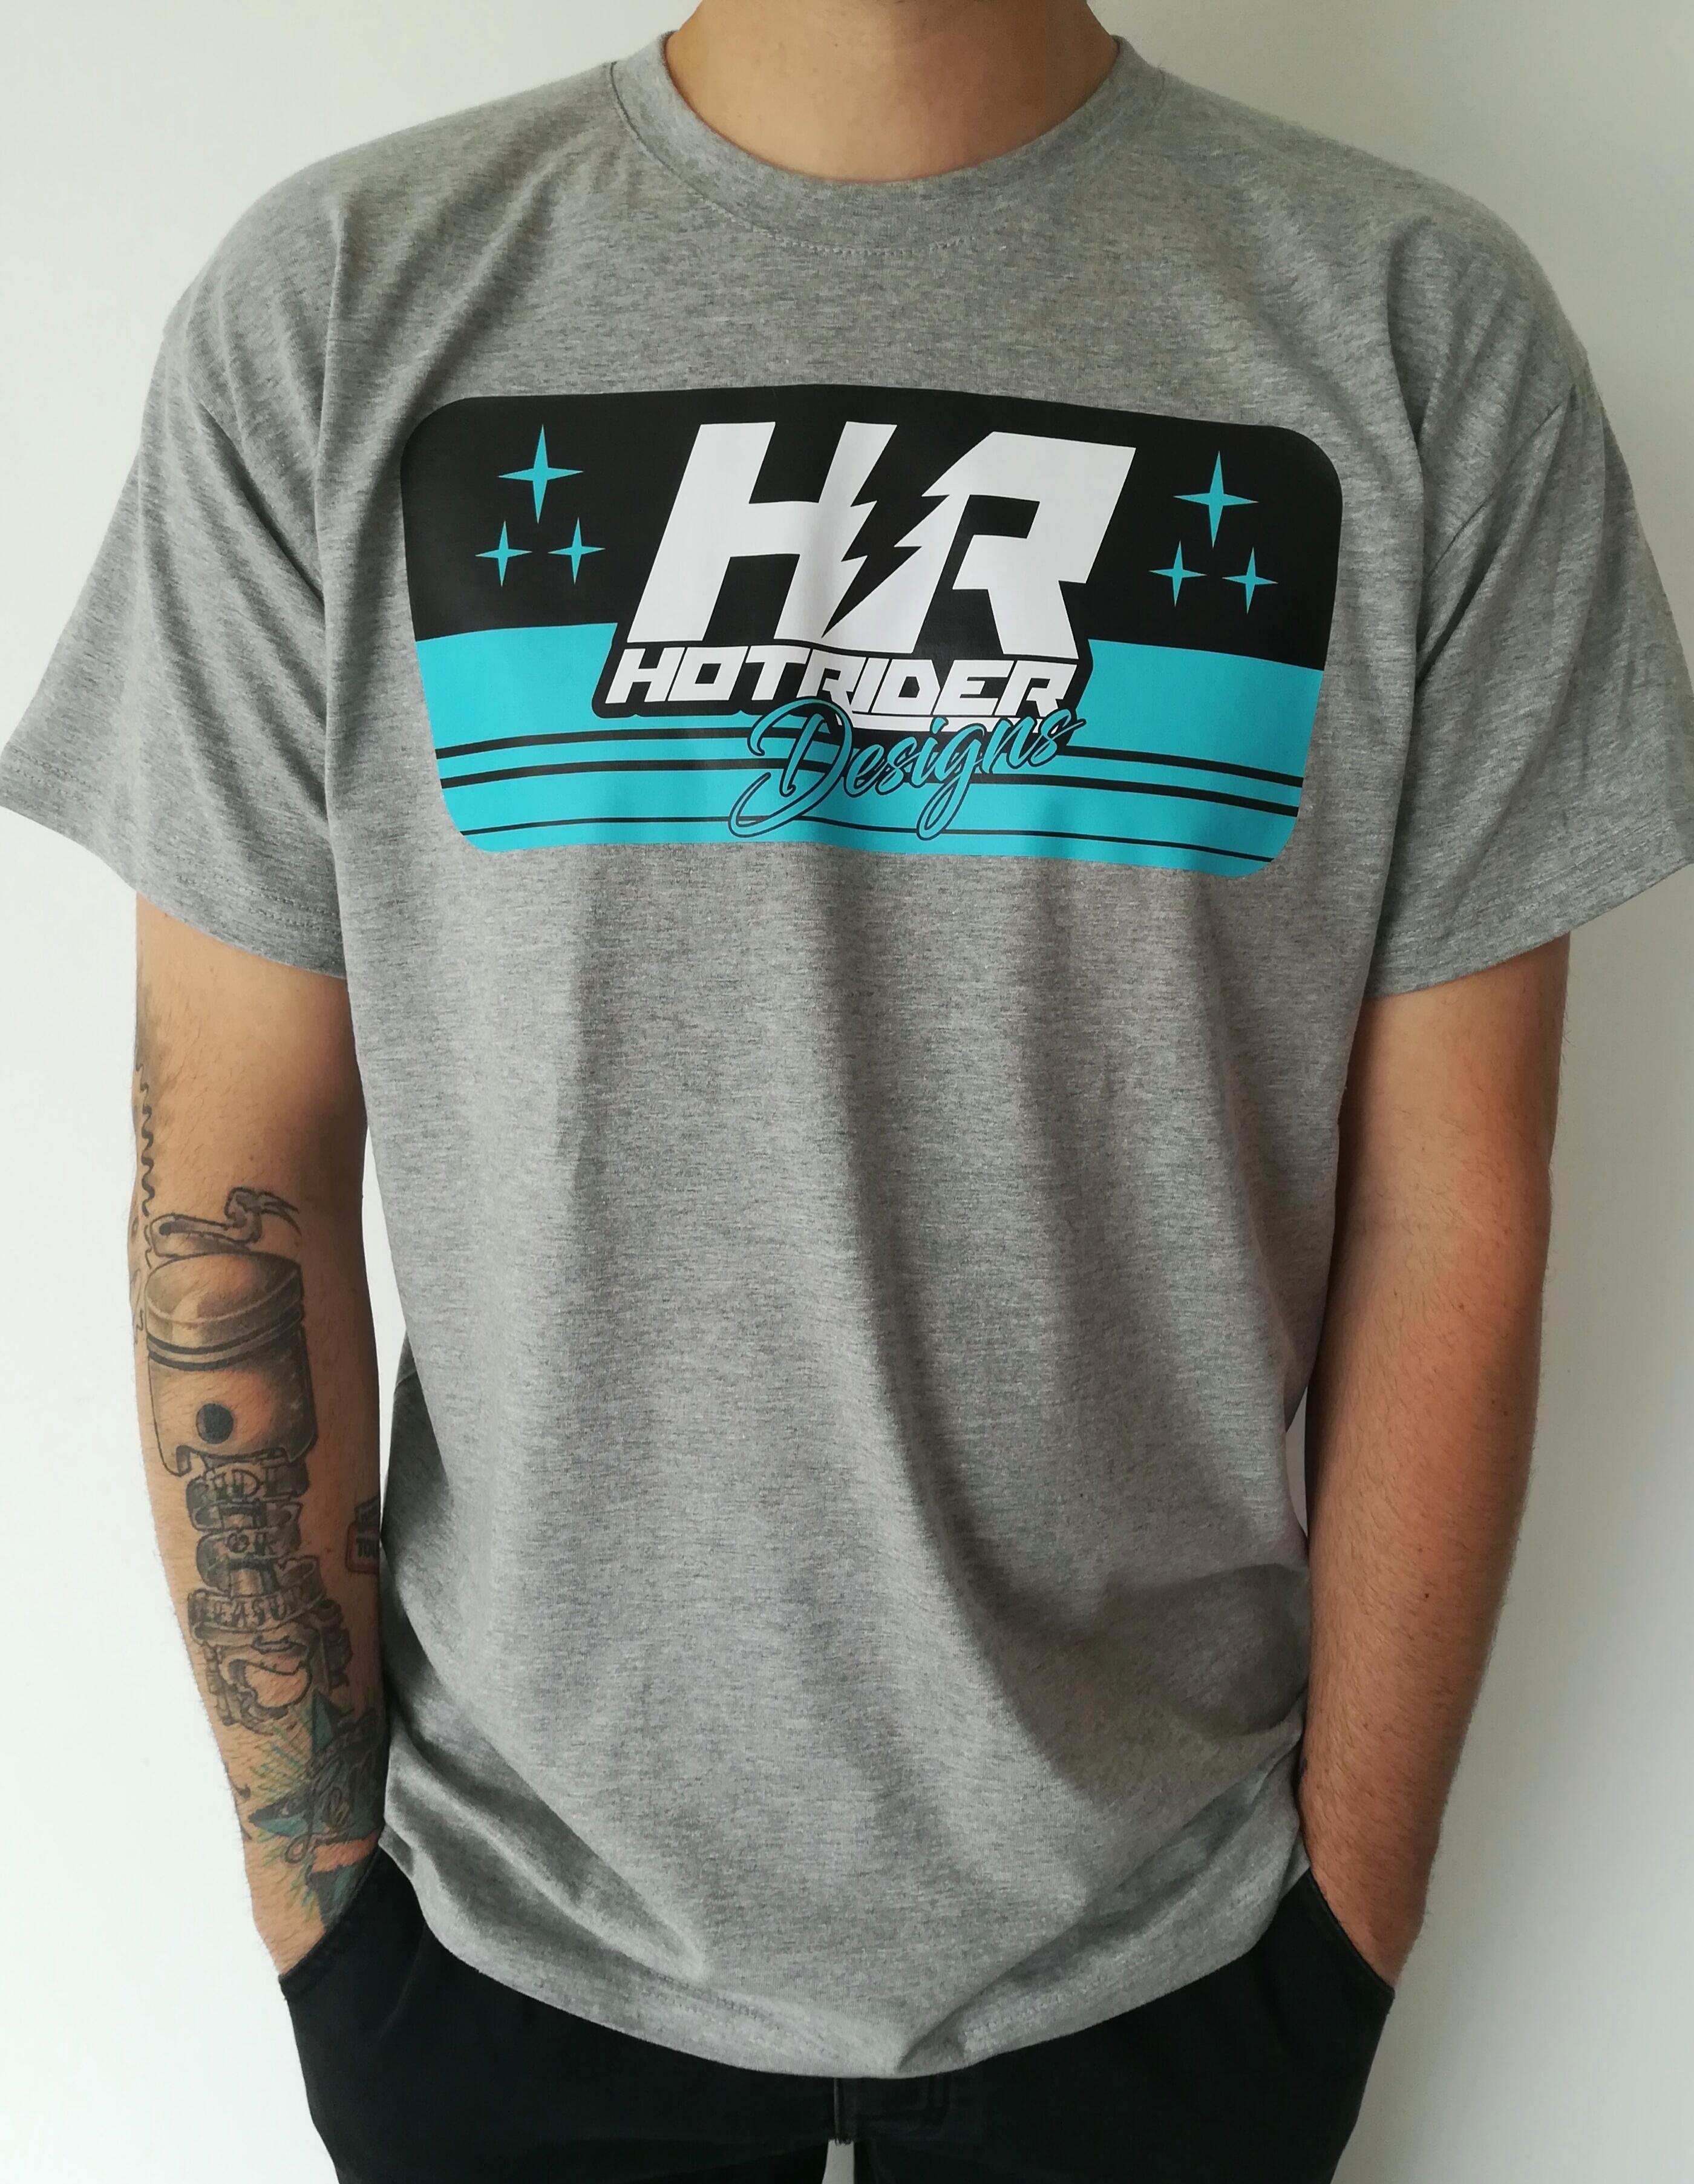 Tee-shirt gris Stars HotRider Design